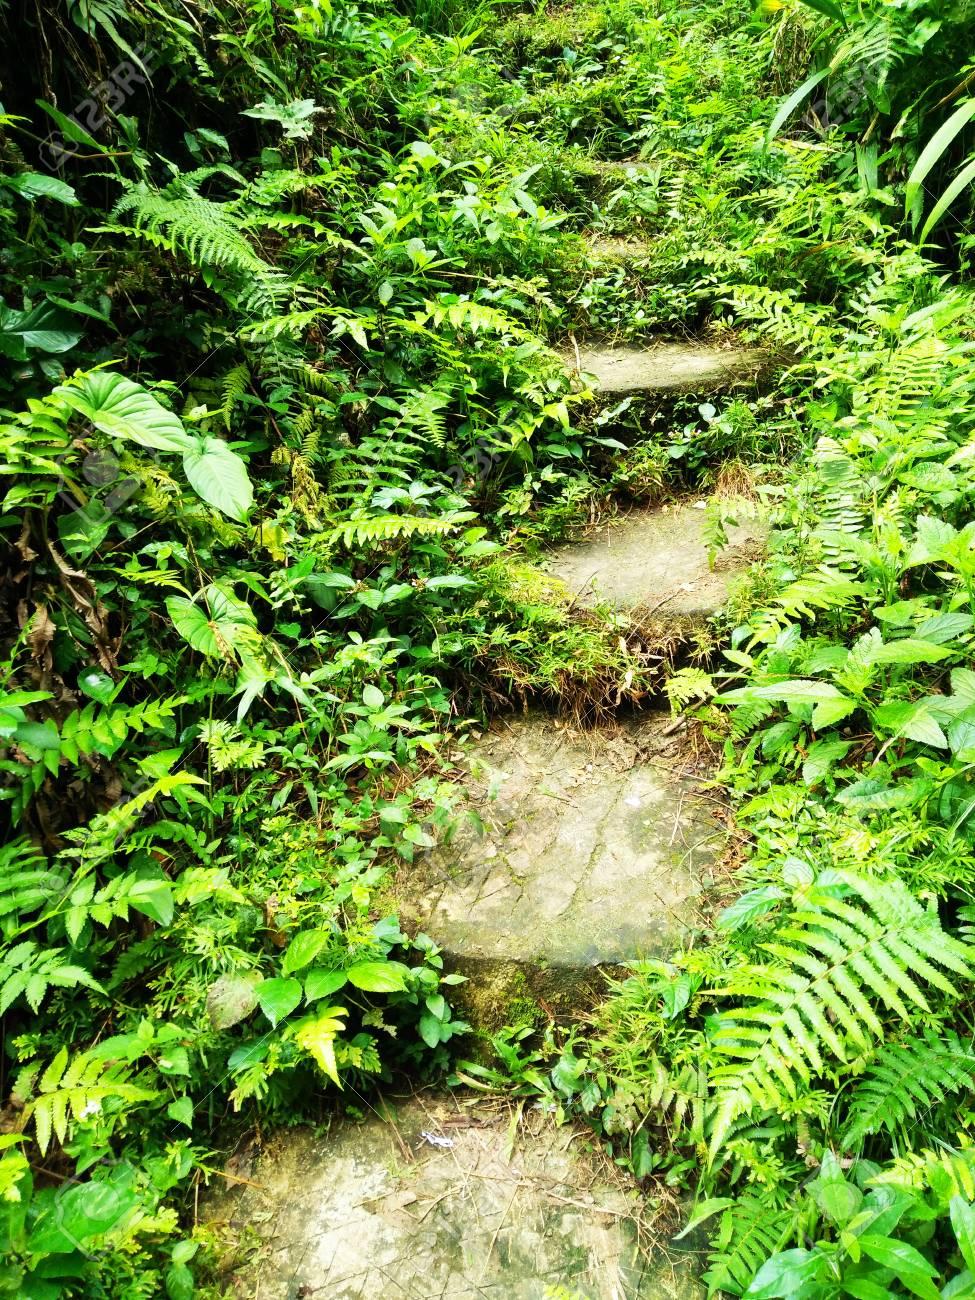 Jungla Tropical Cool Tropical Jungle With Jungla Tropical Amazing